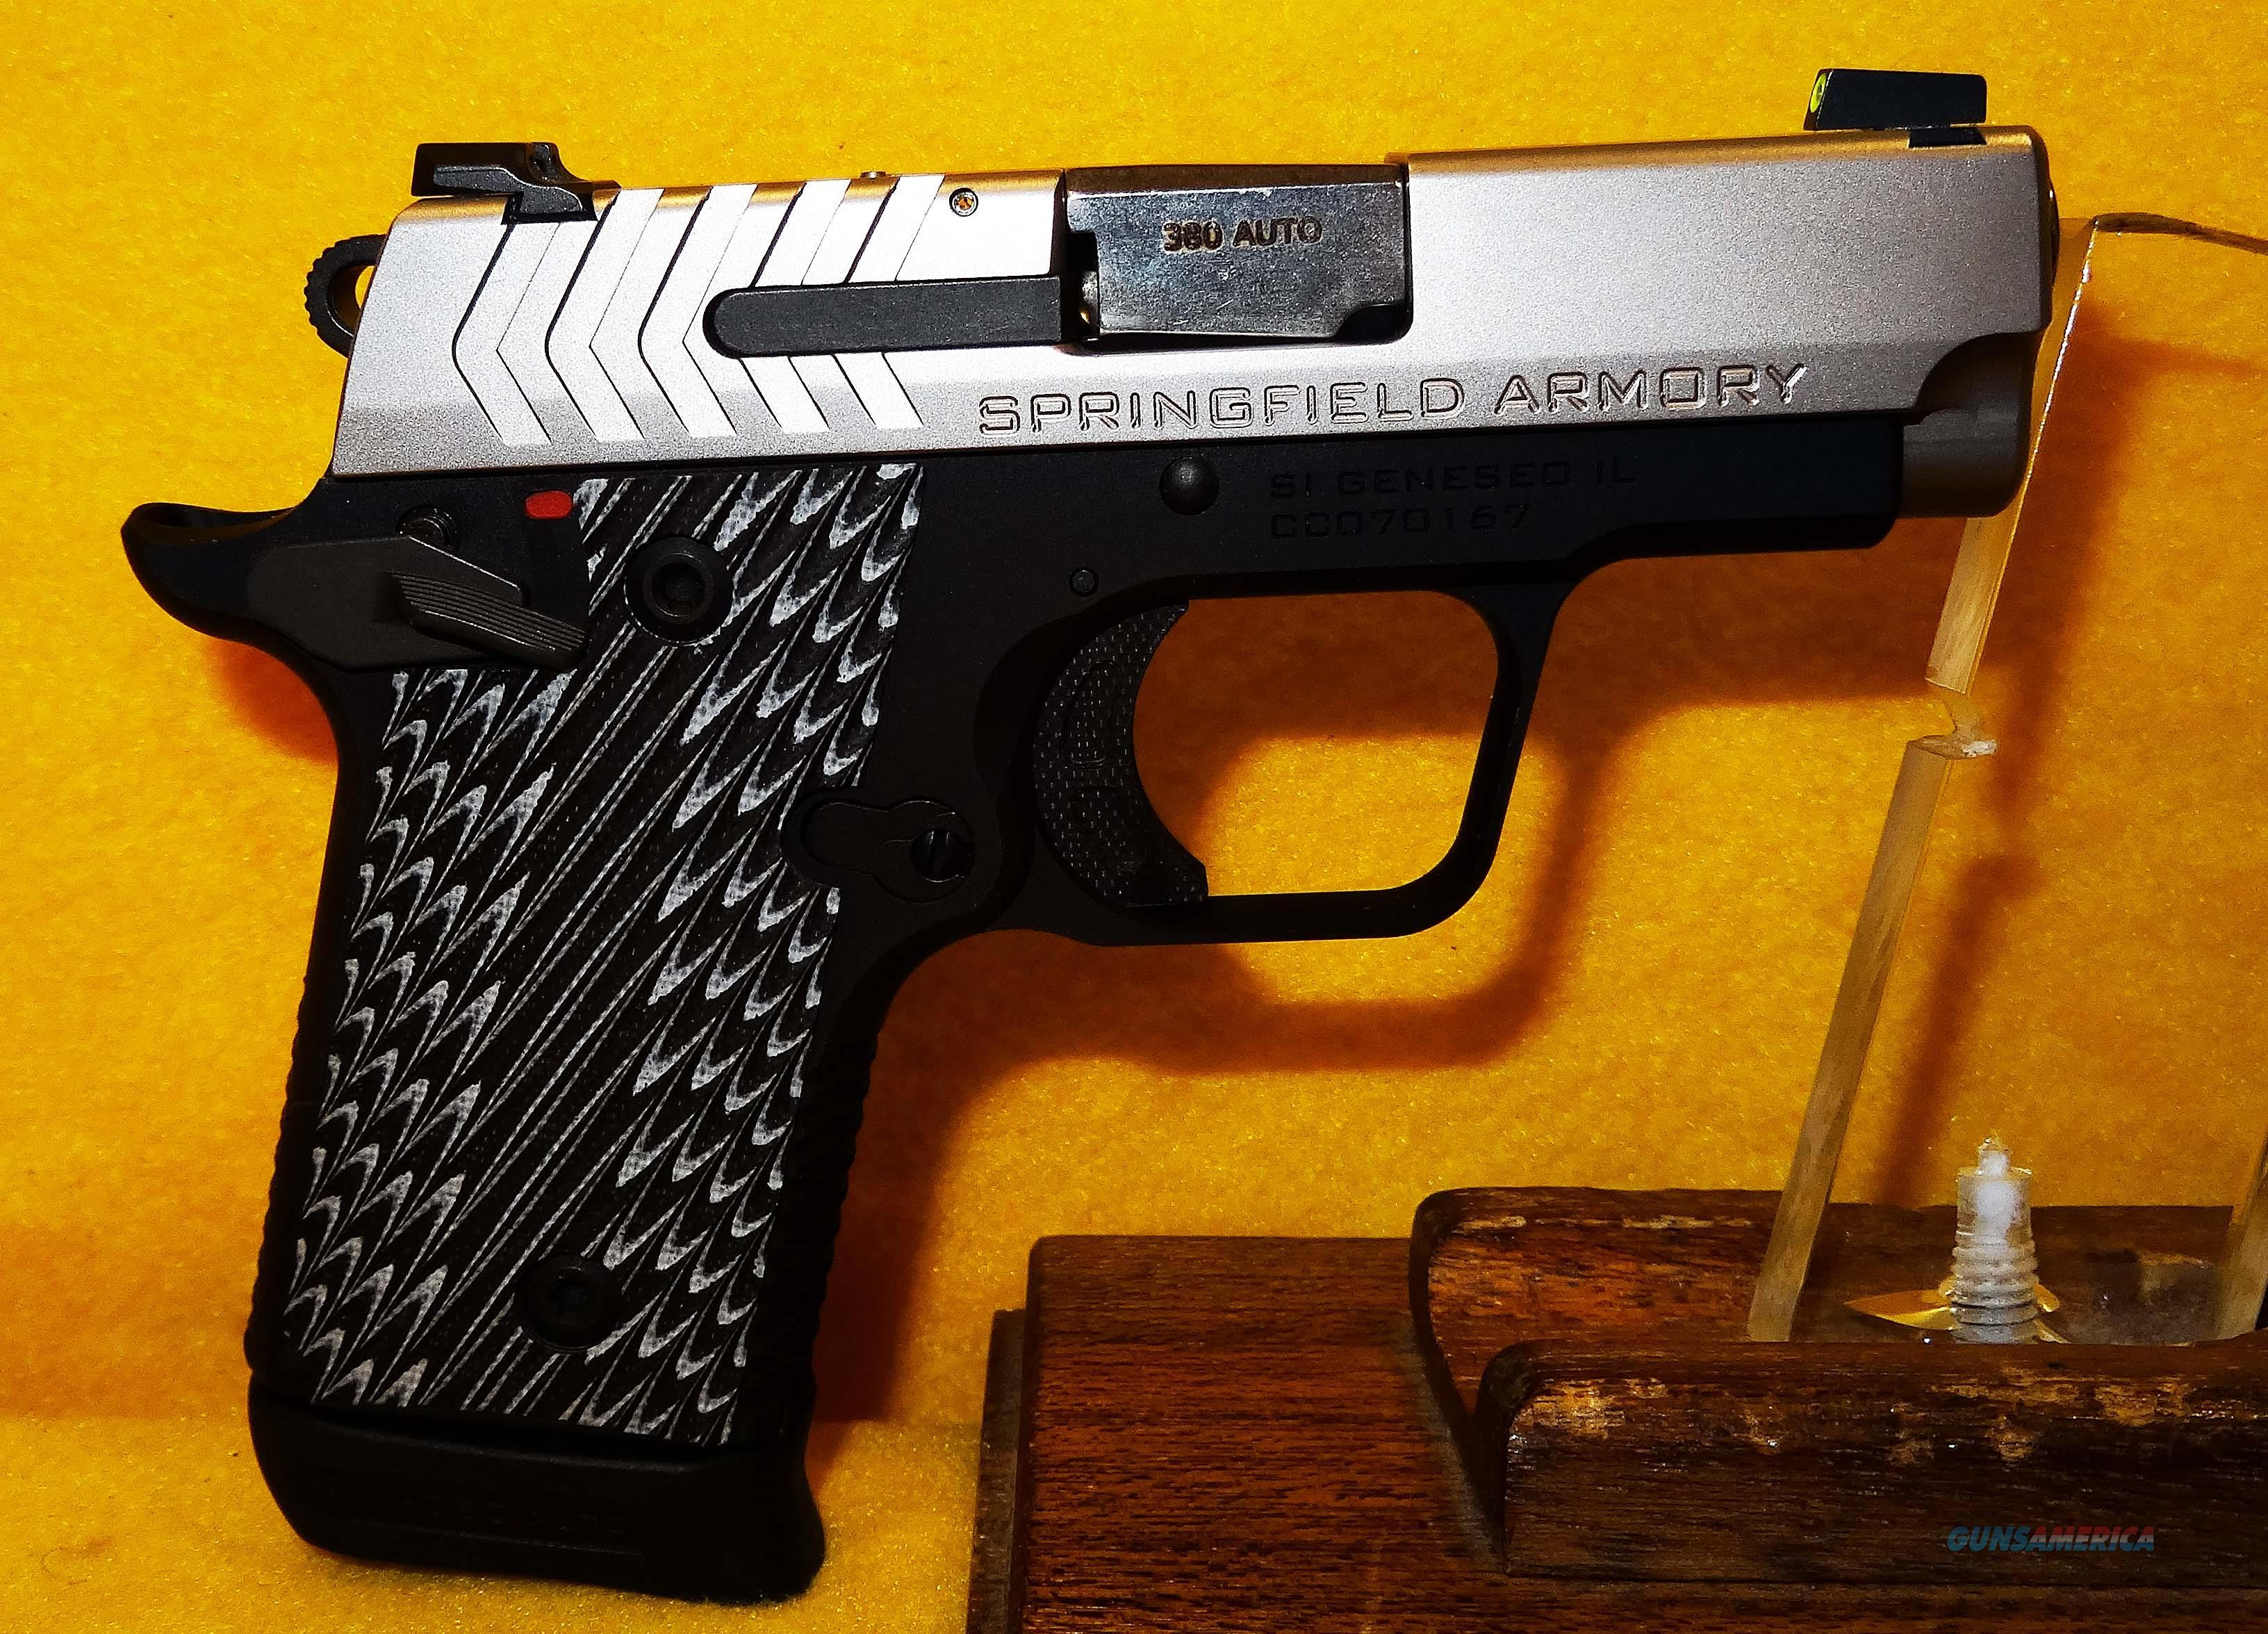 SPRINGFIELD ARMORY 911  Guns > Pistols > Springfield Armory Pistols > 911